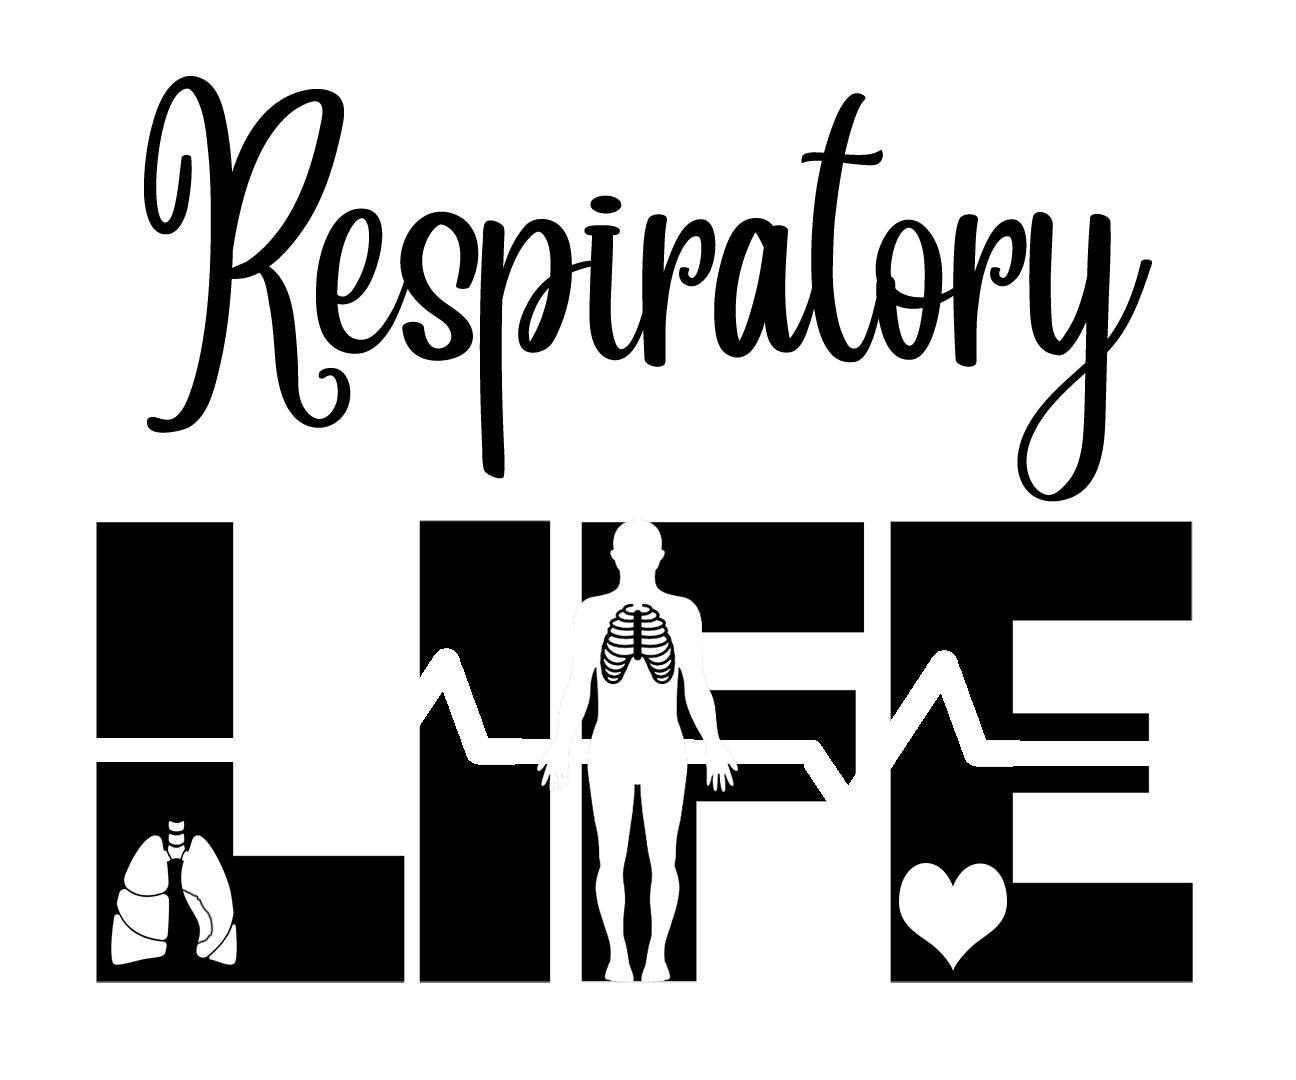 Free Respiratory LIFE SVG File